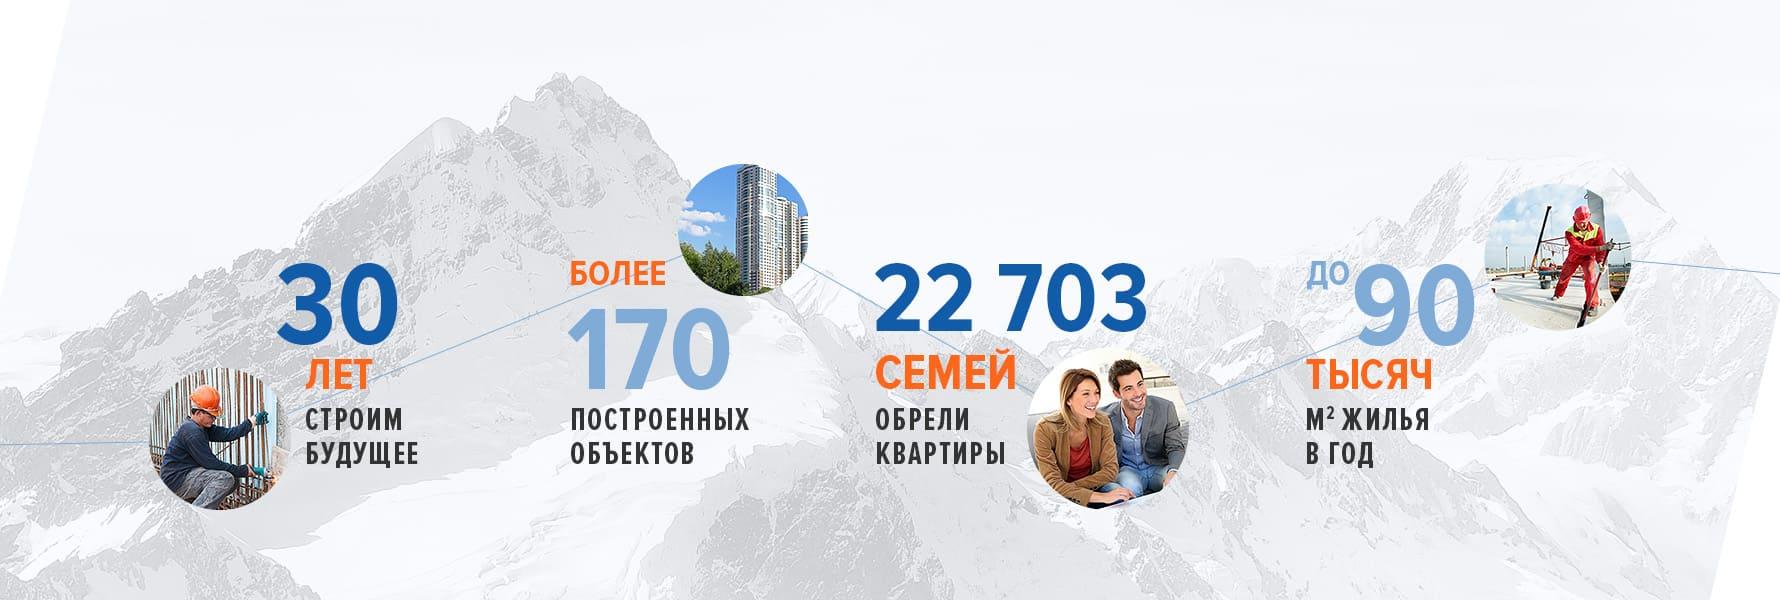 монолитхолдинг красноярск банкротство